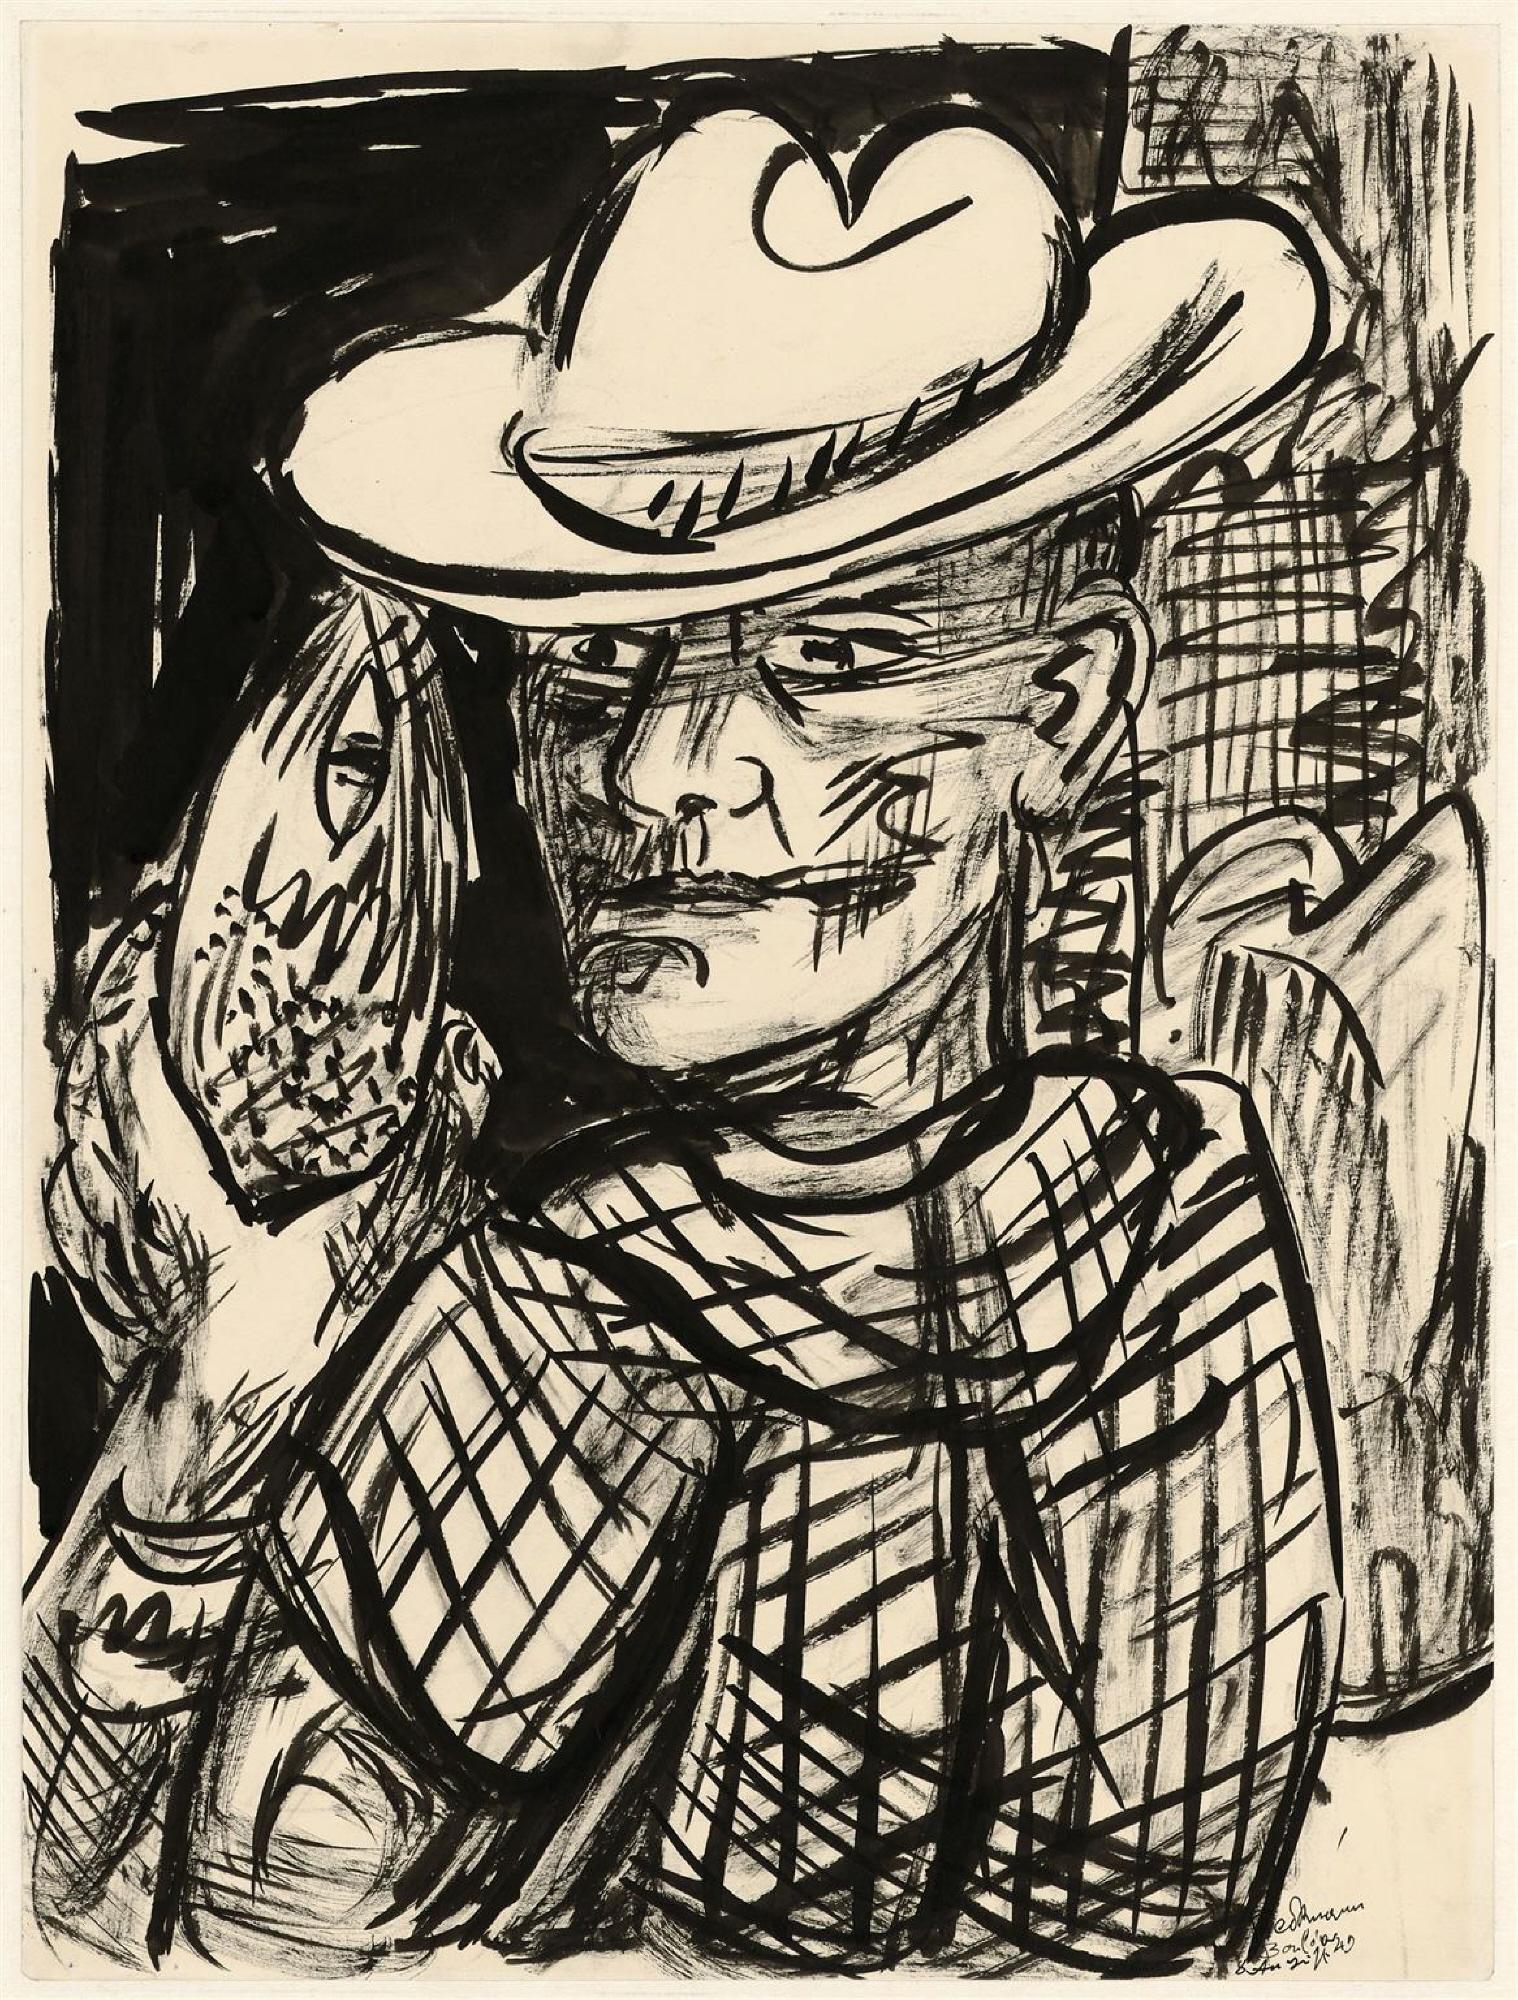 Max Beckmann, (1884 - 1950), Selbstbildnis mit Fisch, 1949, © Hamburger Kunsthalle / bpk Foto: Christoph Irrgang,© VG Bild-Kunst, Bonn, 2020